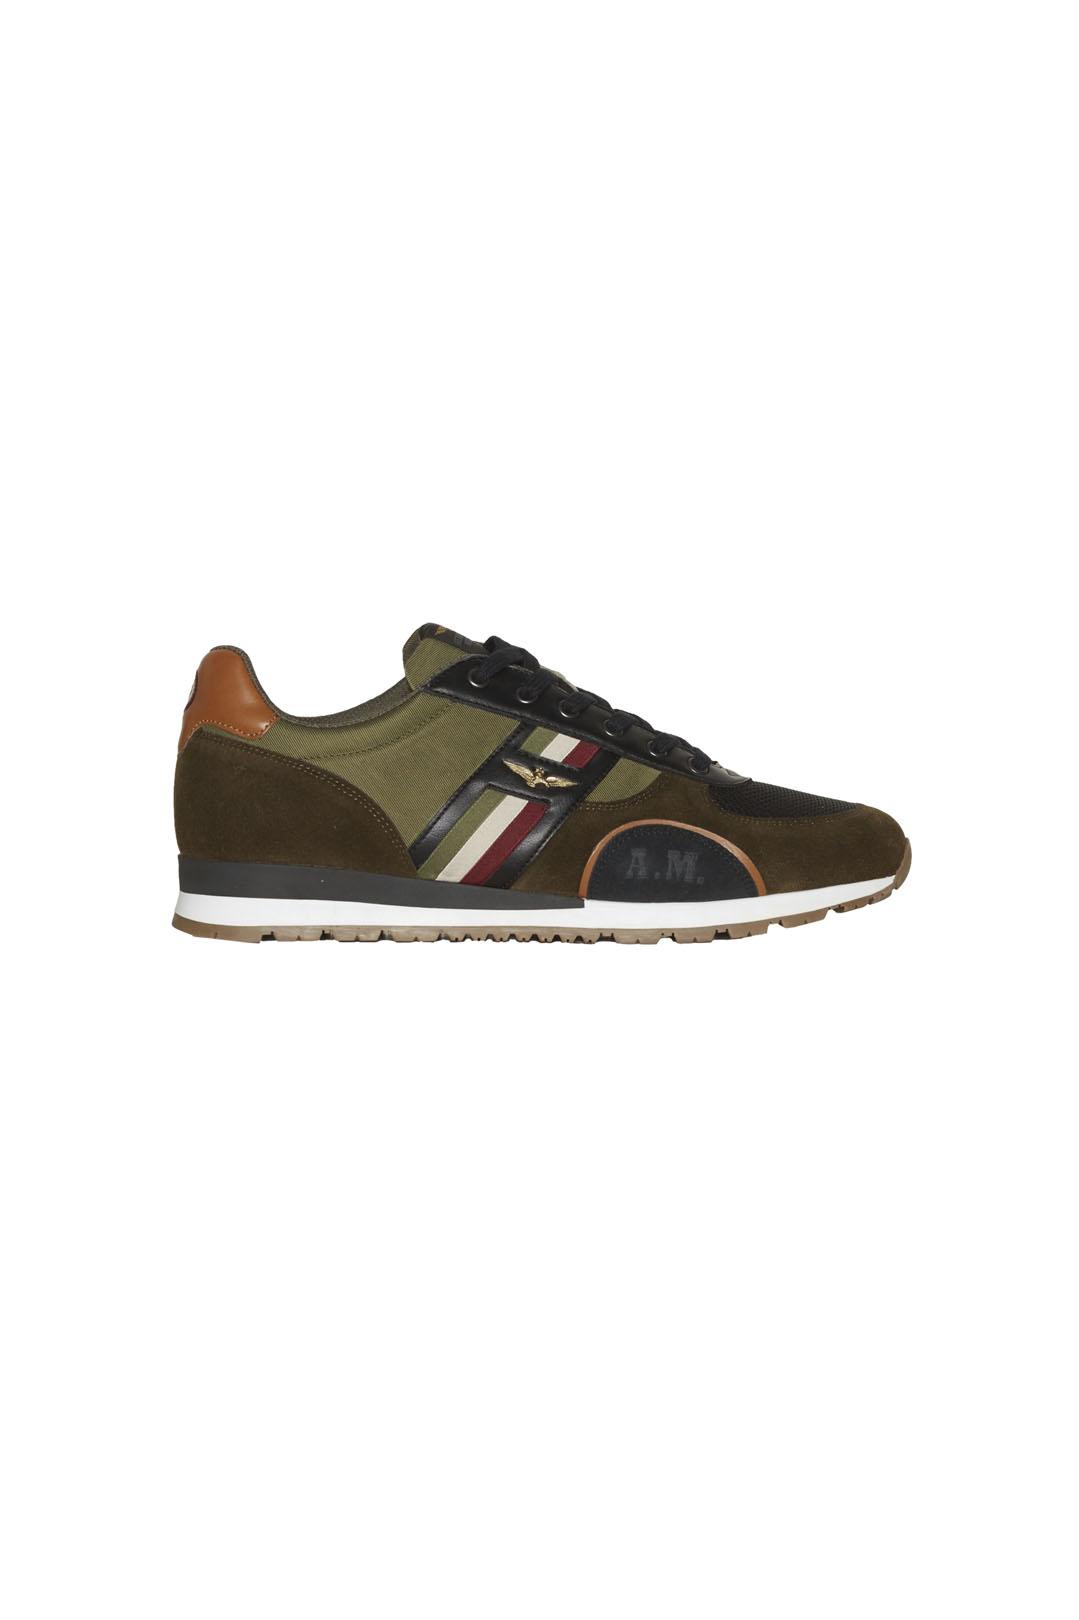 Sneakers avec tricolore                  2